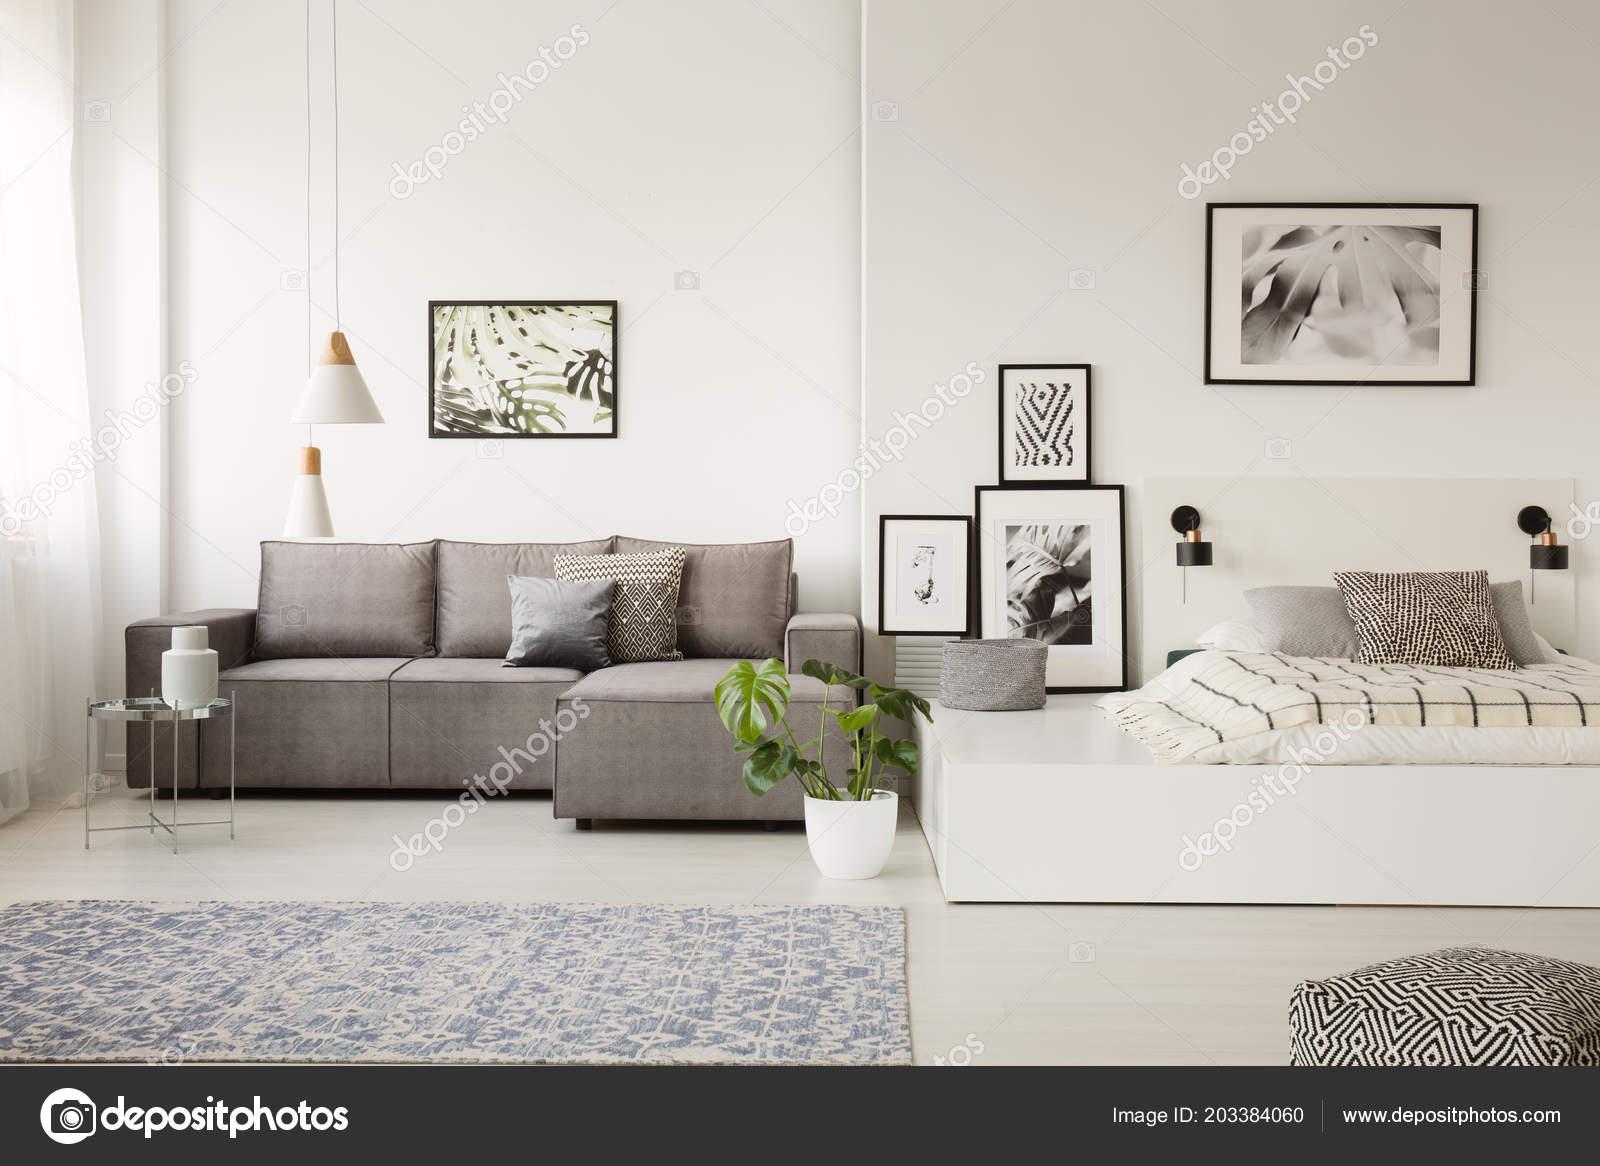 Super Gallery Posters Plant White Apartment Interior Sofa Bed Uwap Interior Chair Design Uwaporg